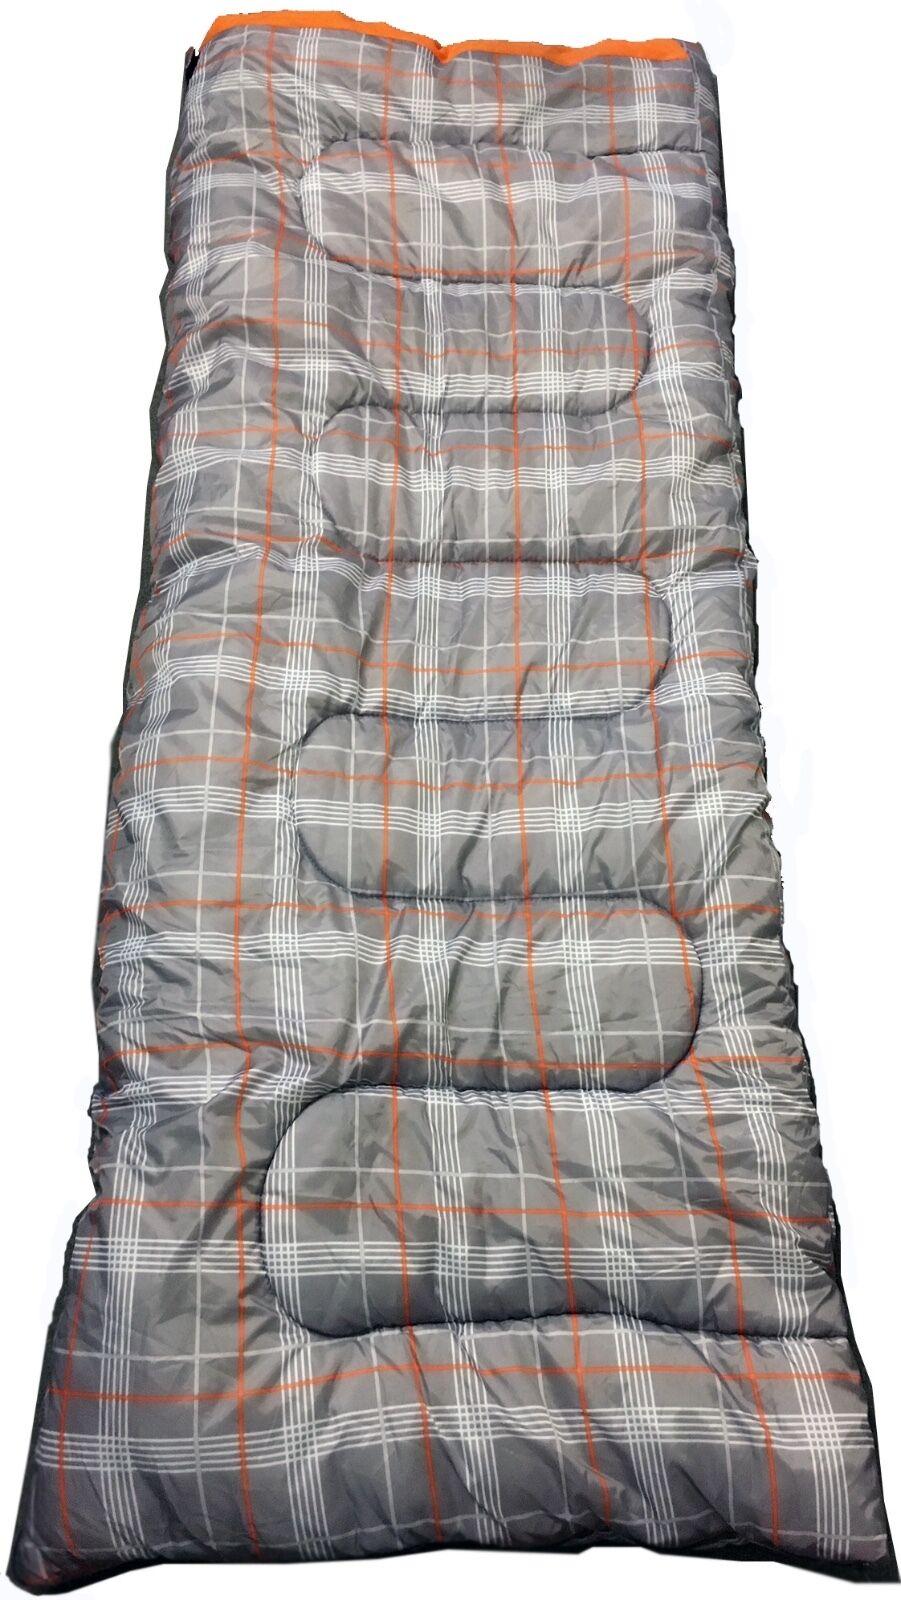 3 Season Sleeping Bag 2 Designs Warm Sleeping Bag Camping  Sleeping Bag Duvet  best prices and freshest styles